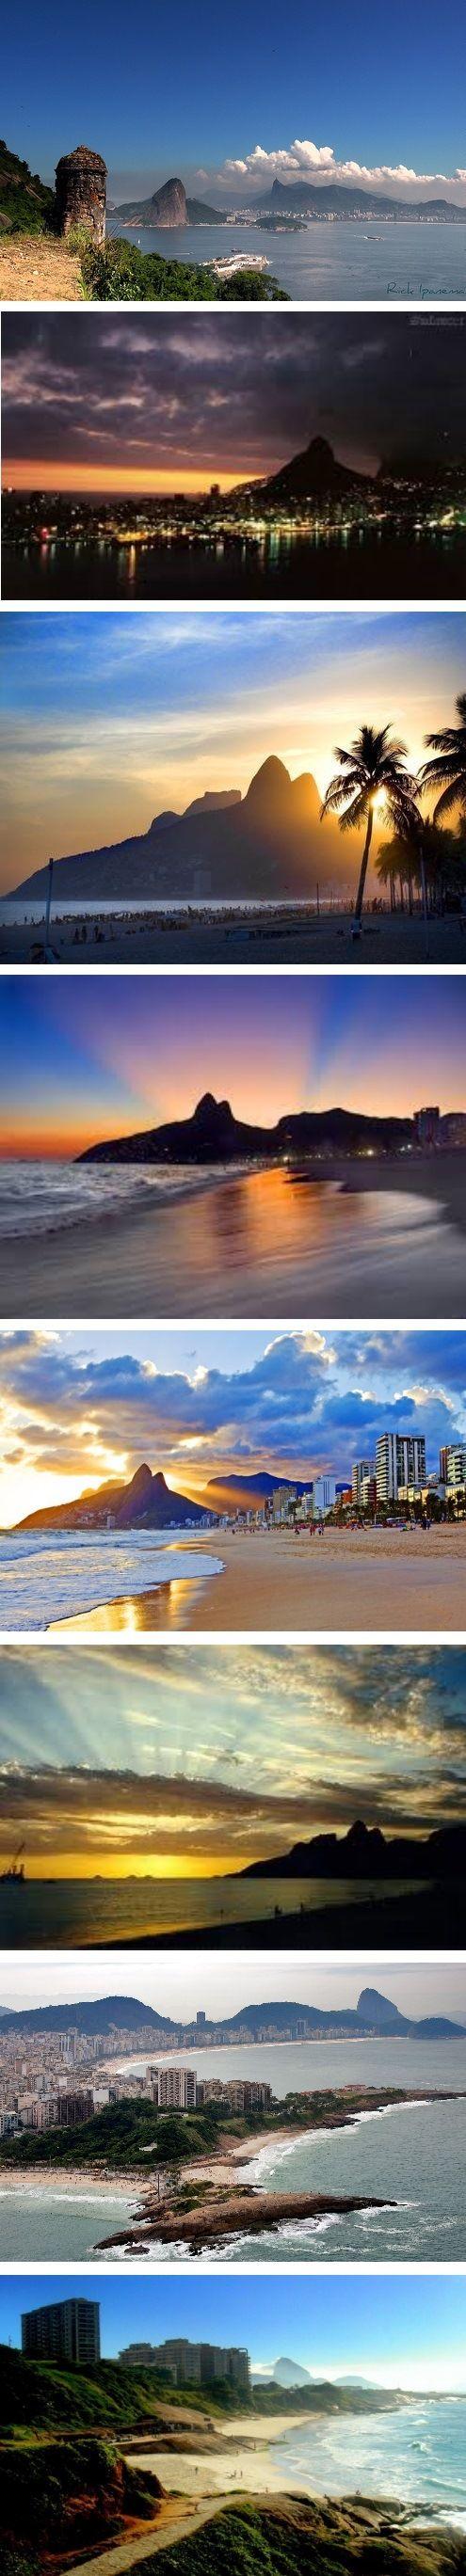 ~Sunset over Rio de Janeiro, Brazil   The House of Beccaria